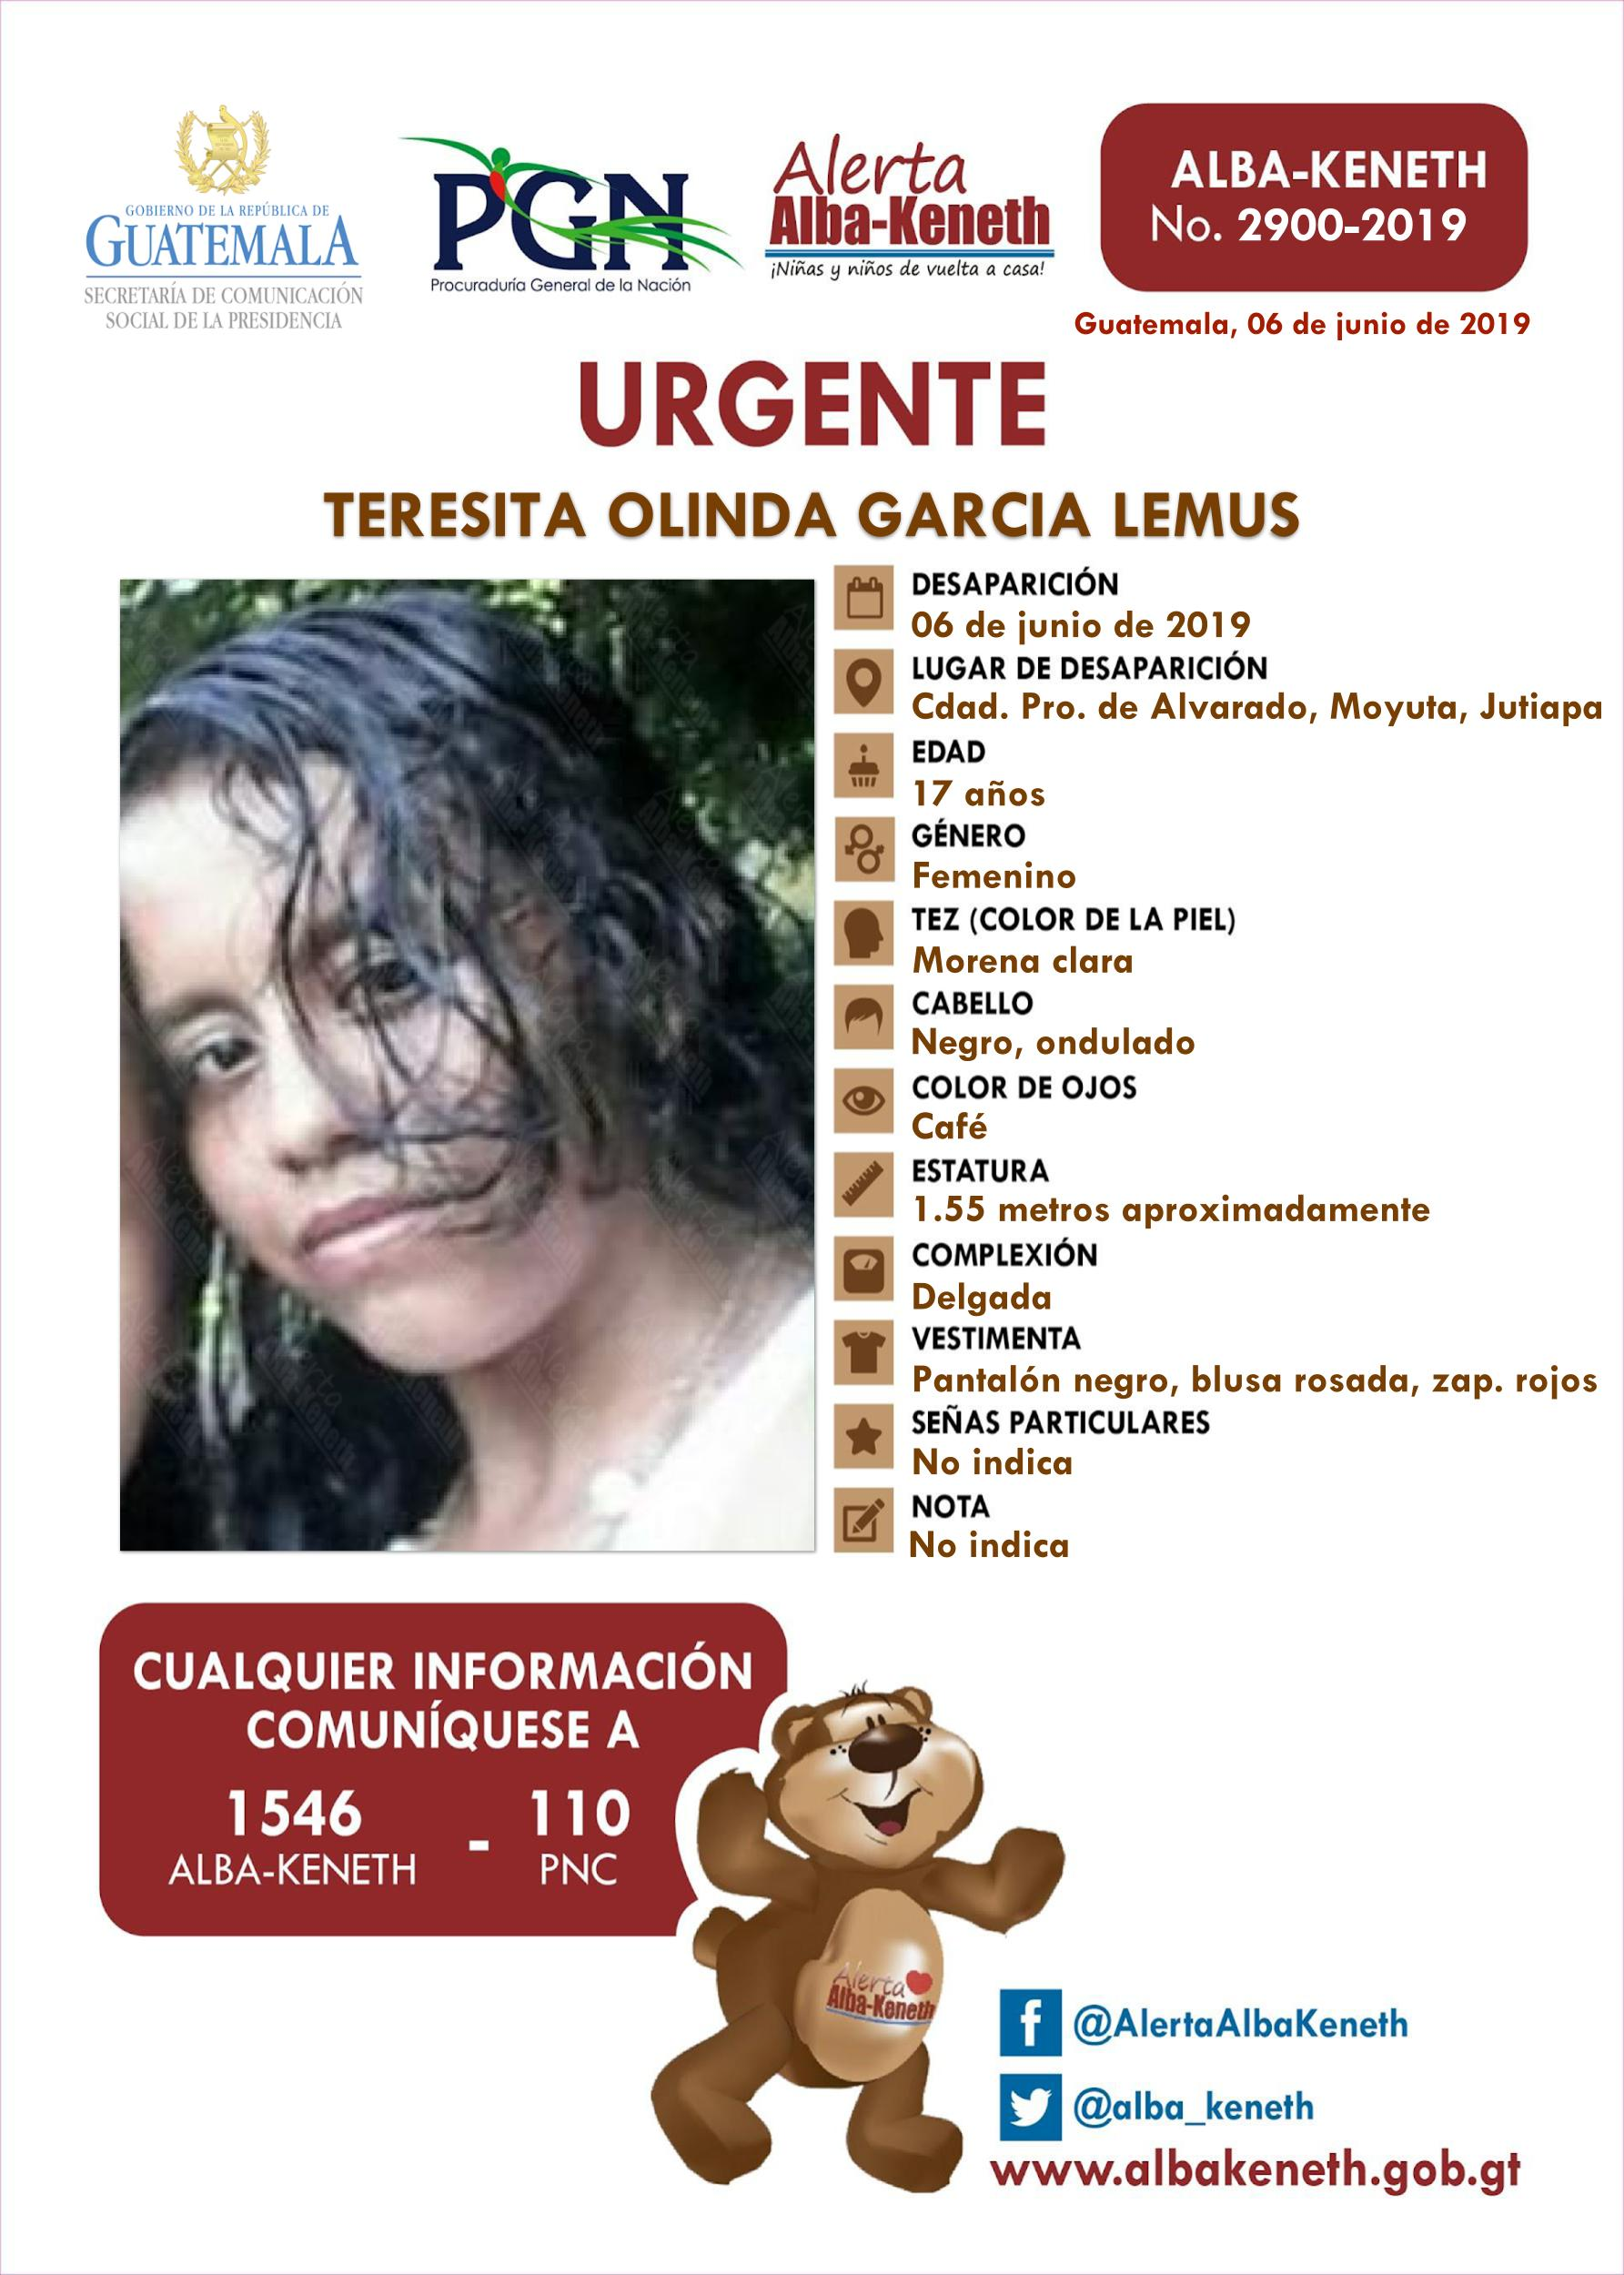 Teresita Olinda Garcia Lemus